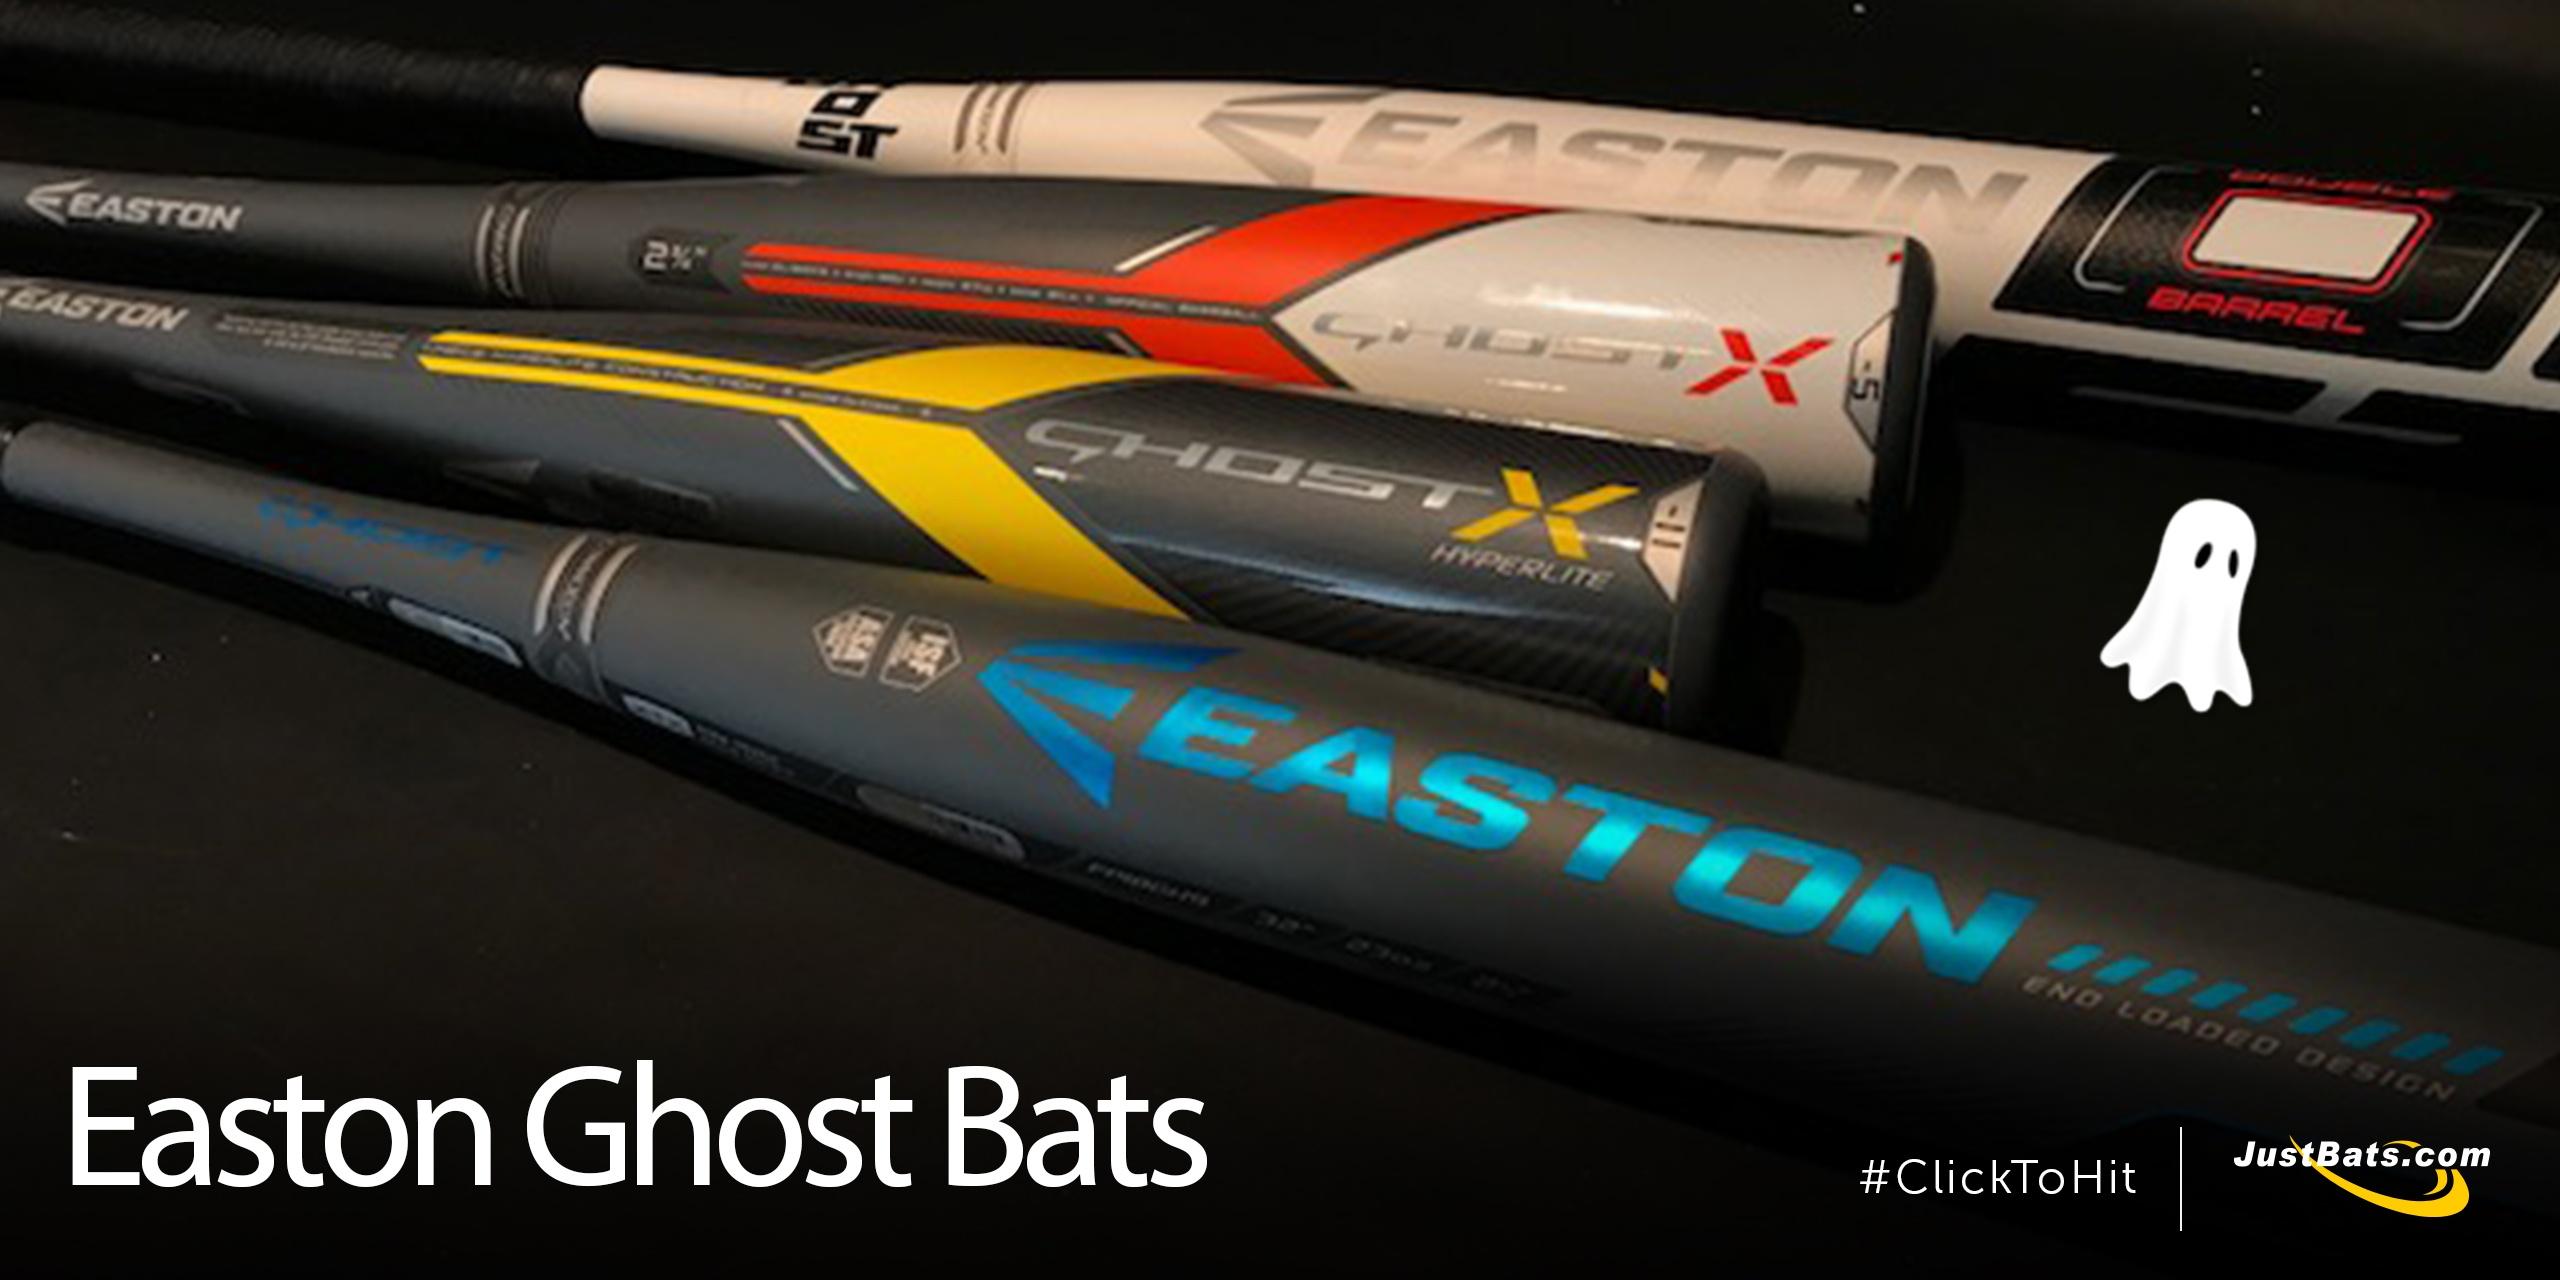 Easton Ghost Bats - Blog